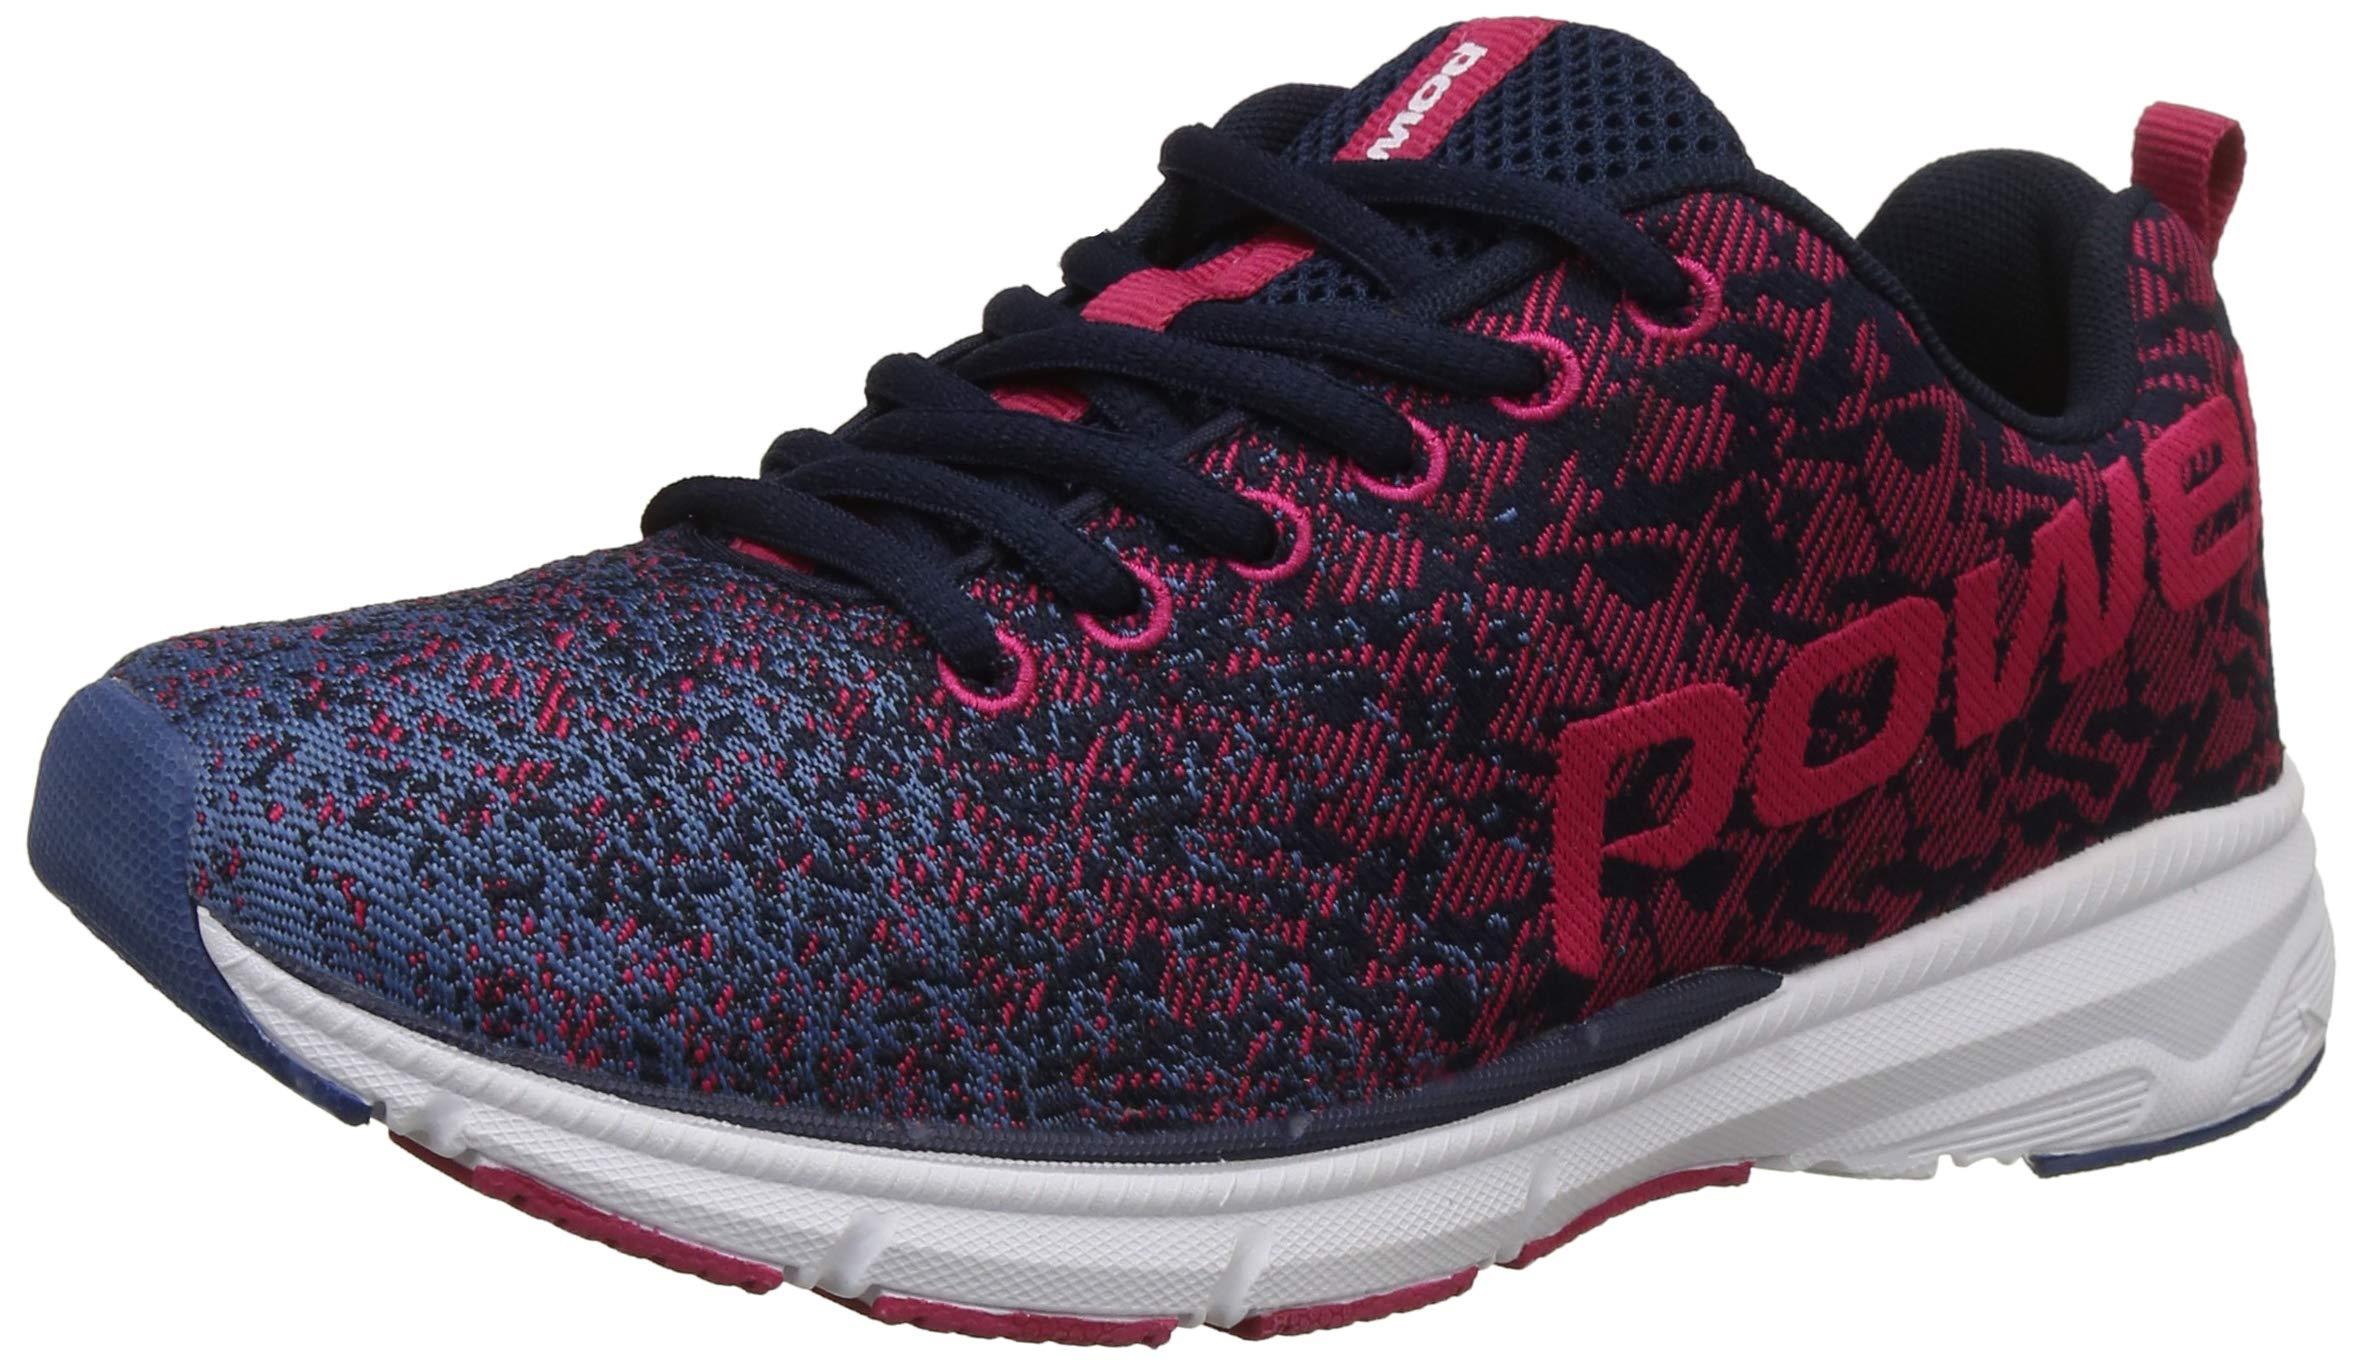 Power Women's Storm Erupt Running Shoes